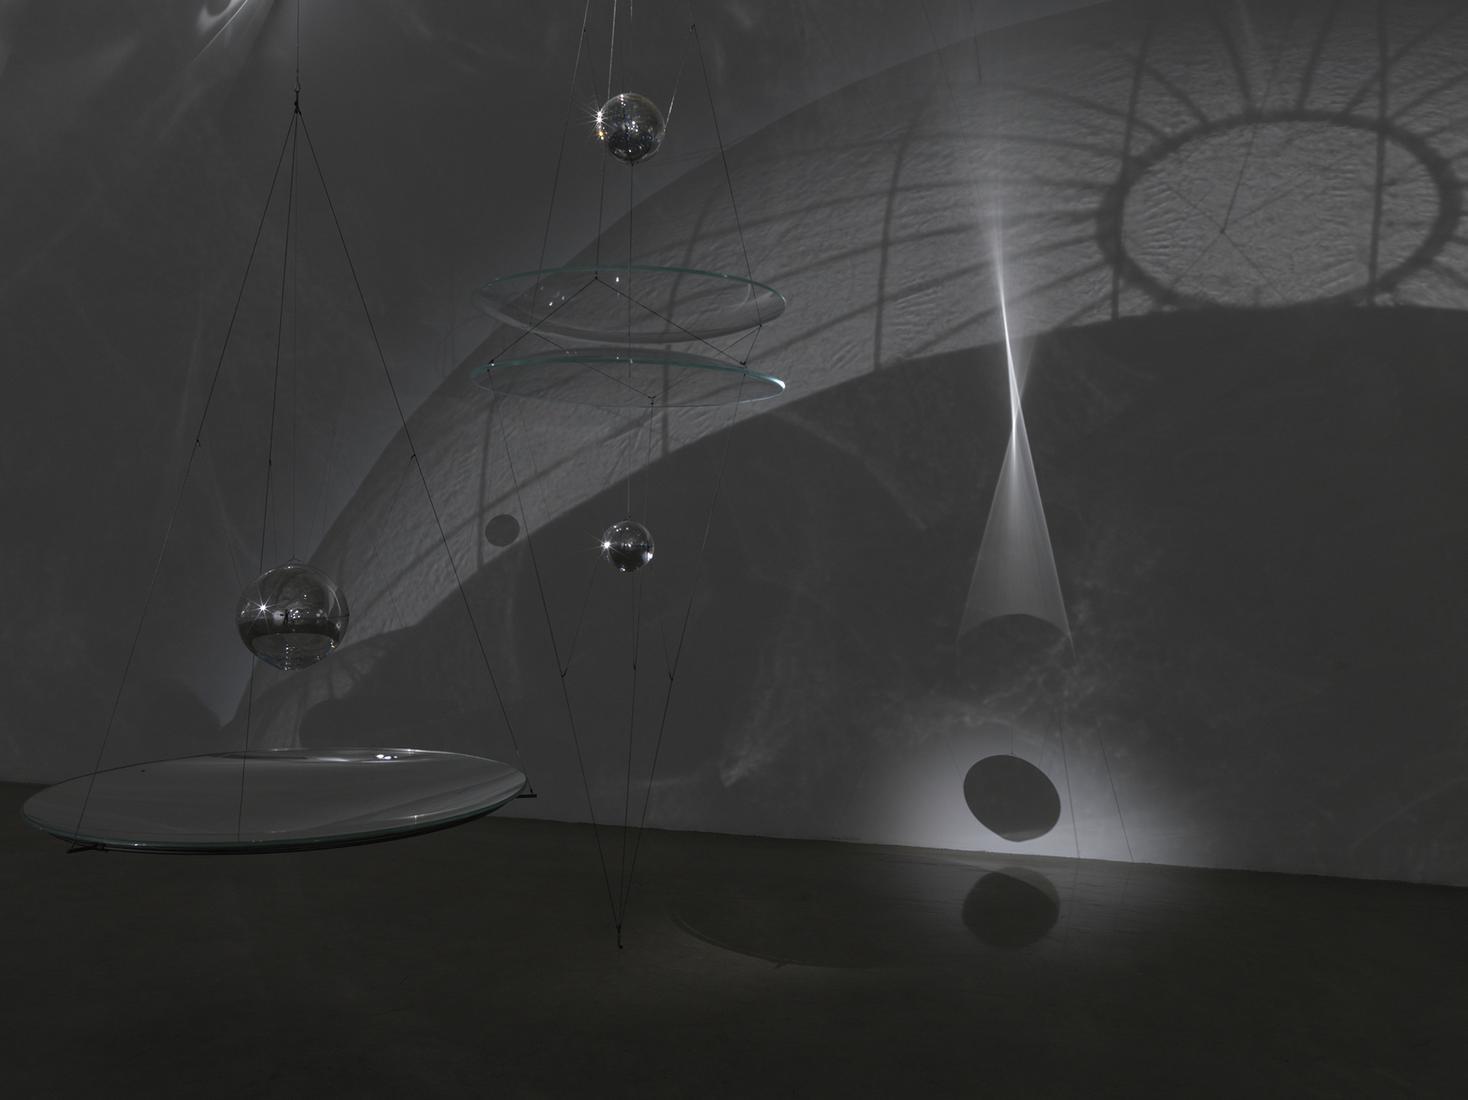 Tomás Saraceno: Solar Rhythms - Exhibitions